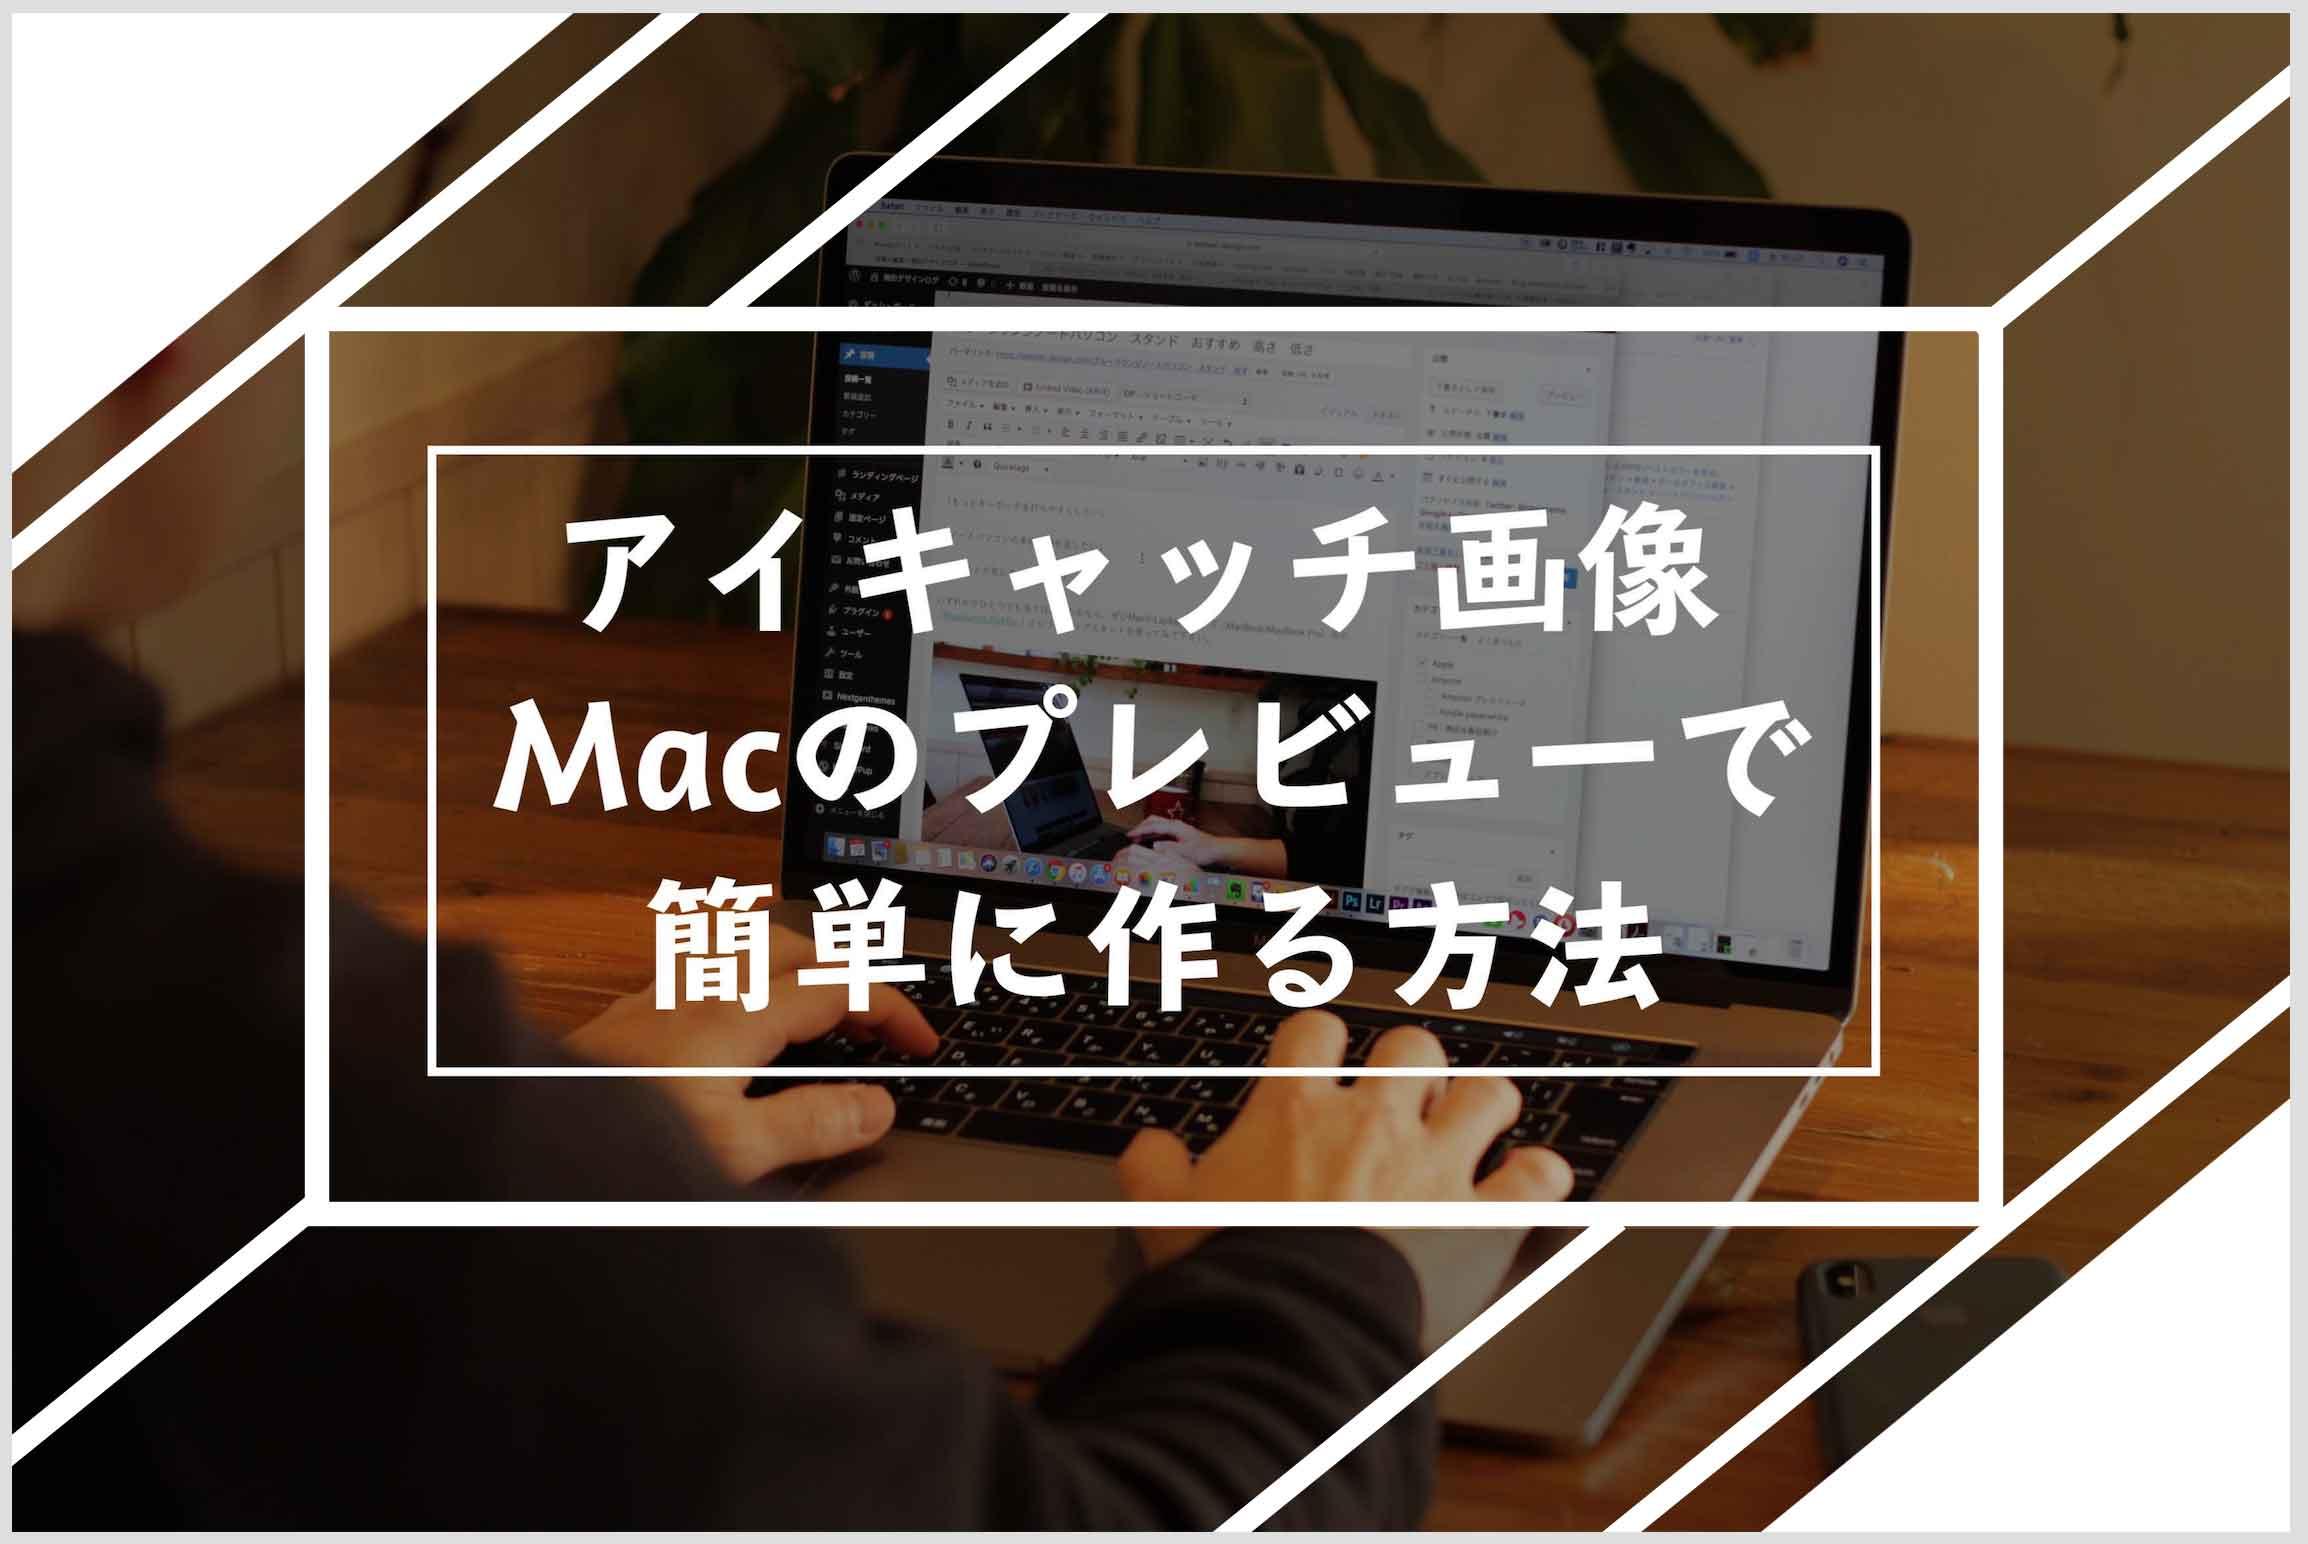 Macのプレビューでアイキャッチ画像を簡単に作る方法